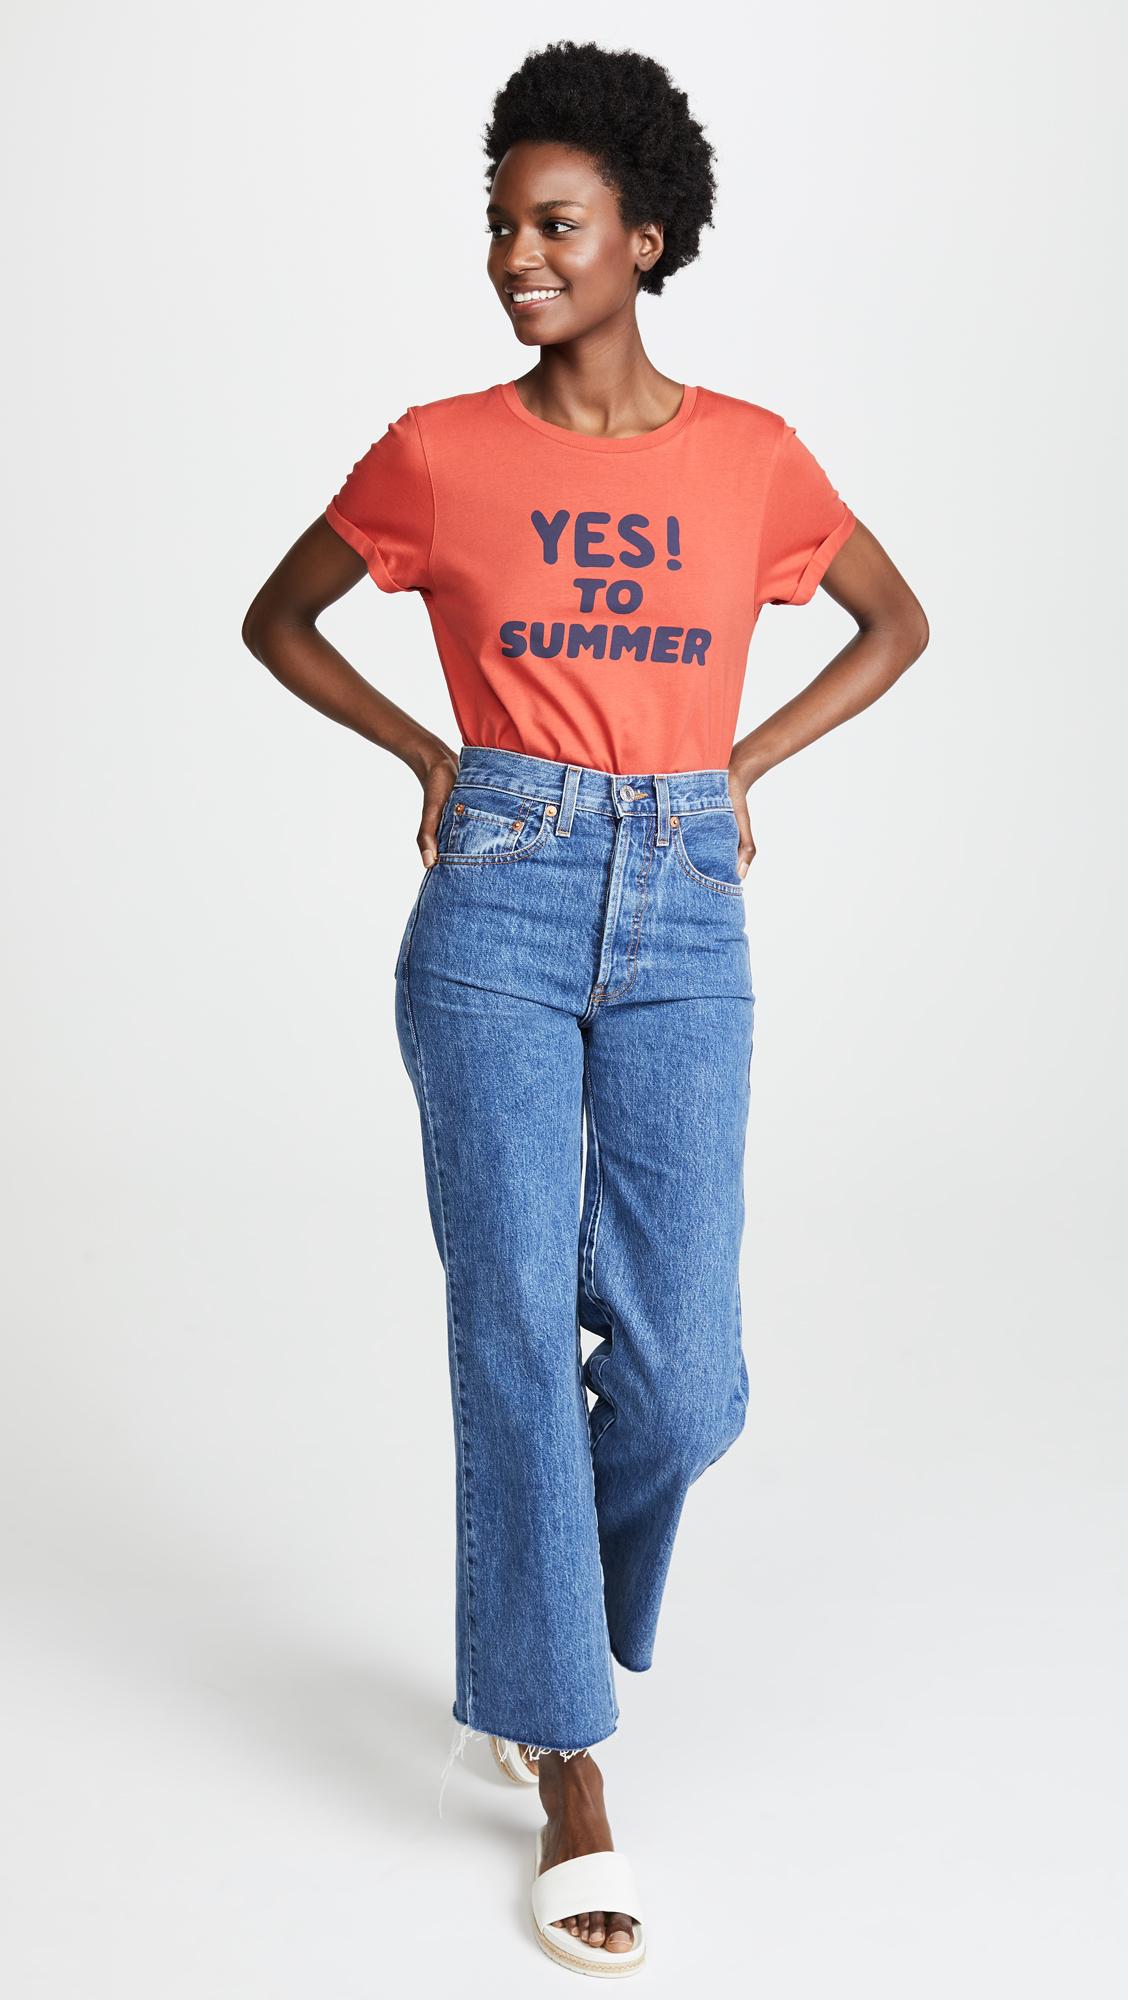 a3bc0e70d87b A.P.C. Yes To Summer T Shirt